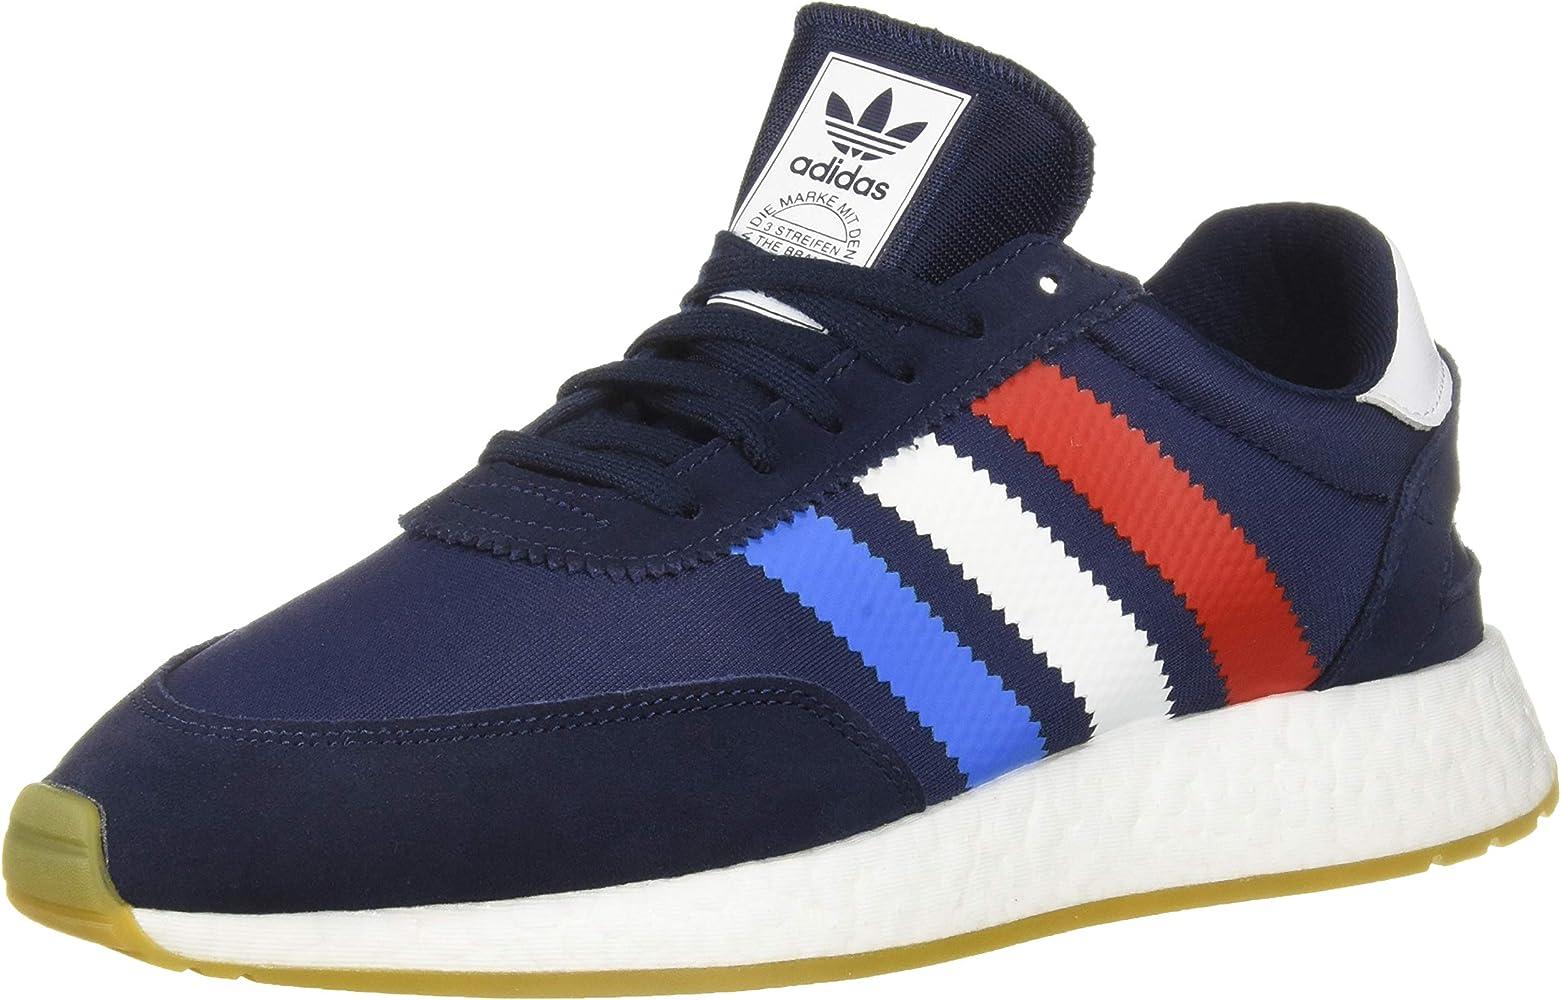 adidas i 5923 for running